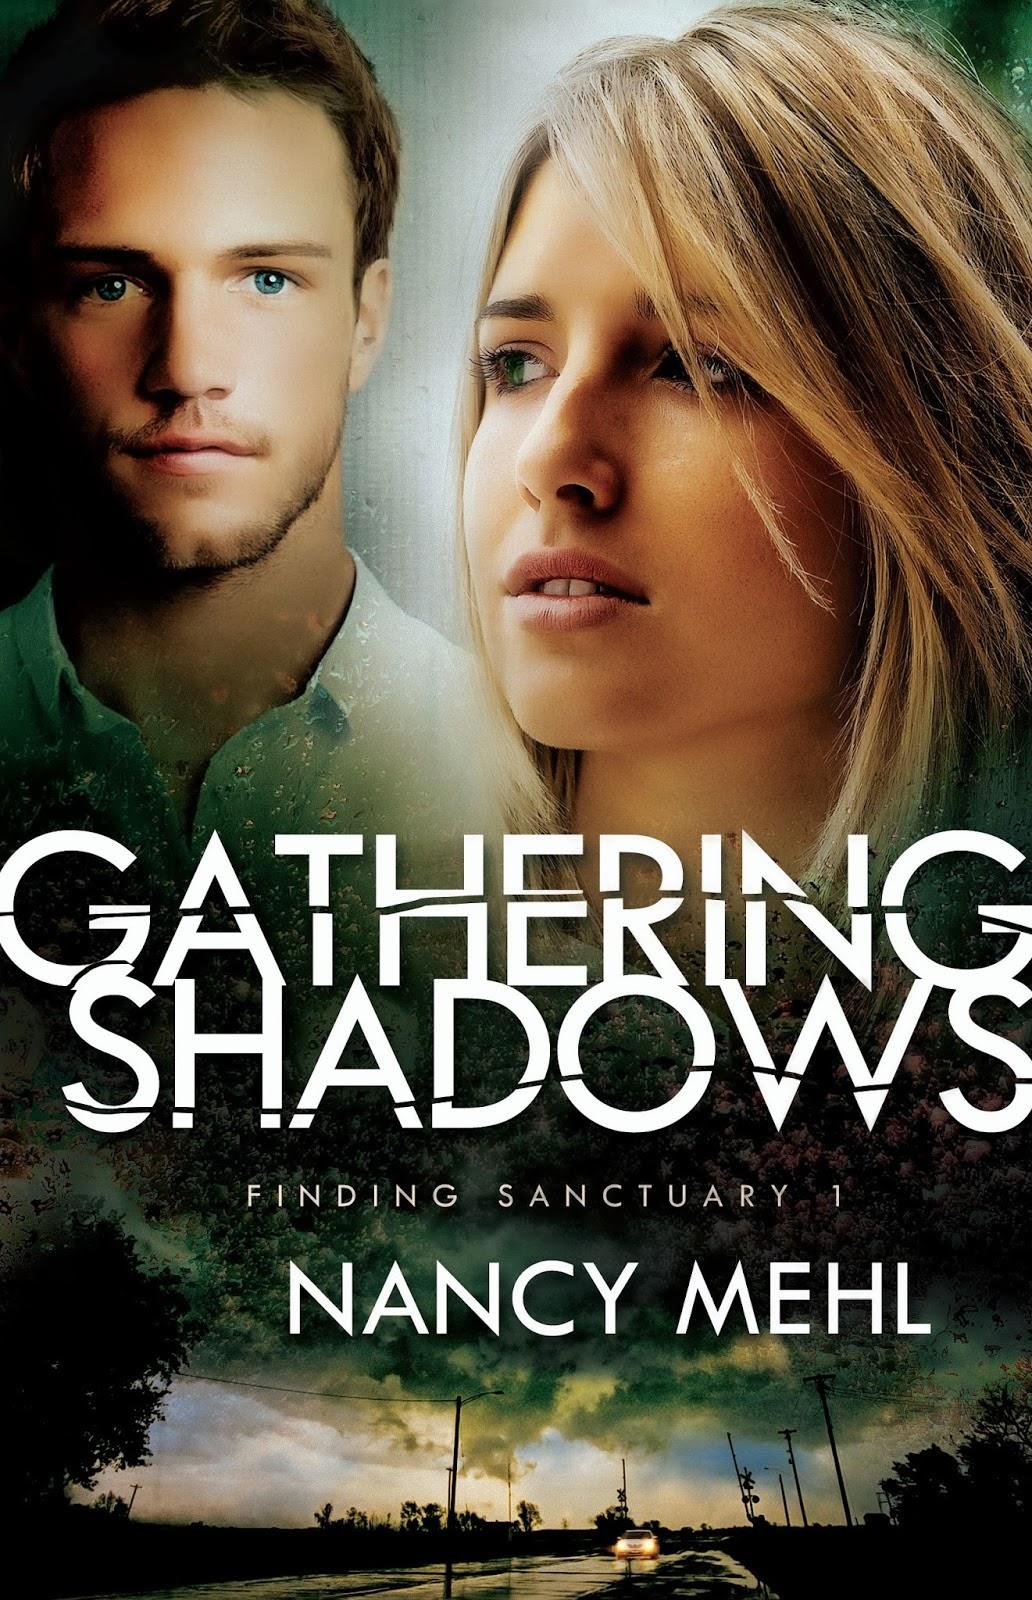 Gathering Shadows by Nancy Mehl